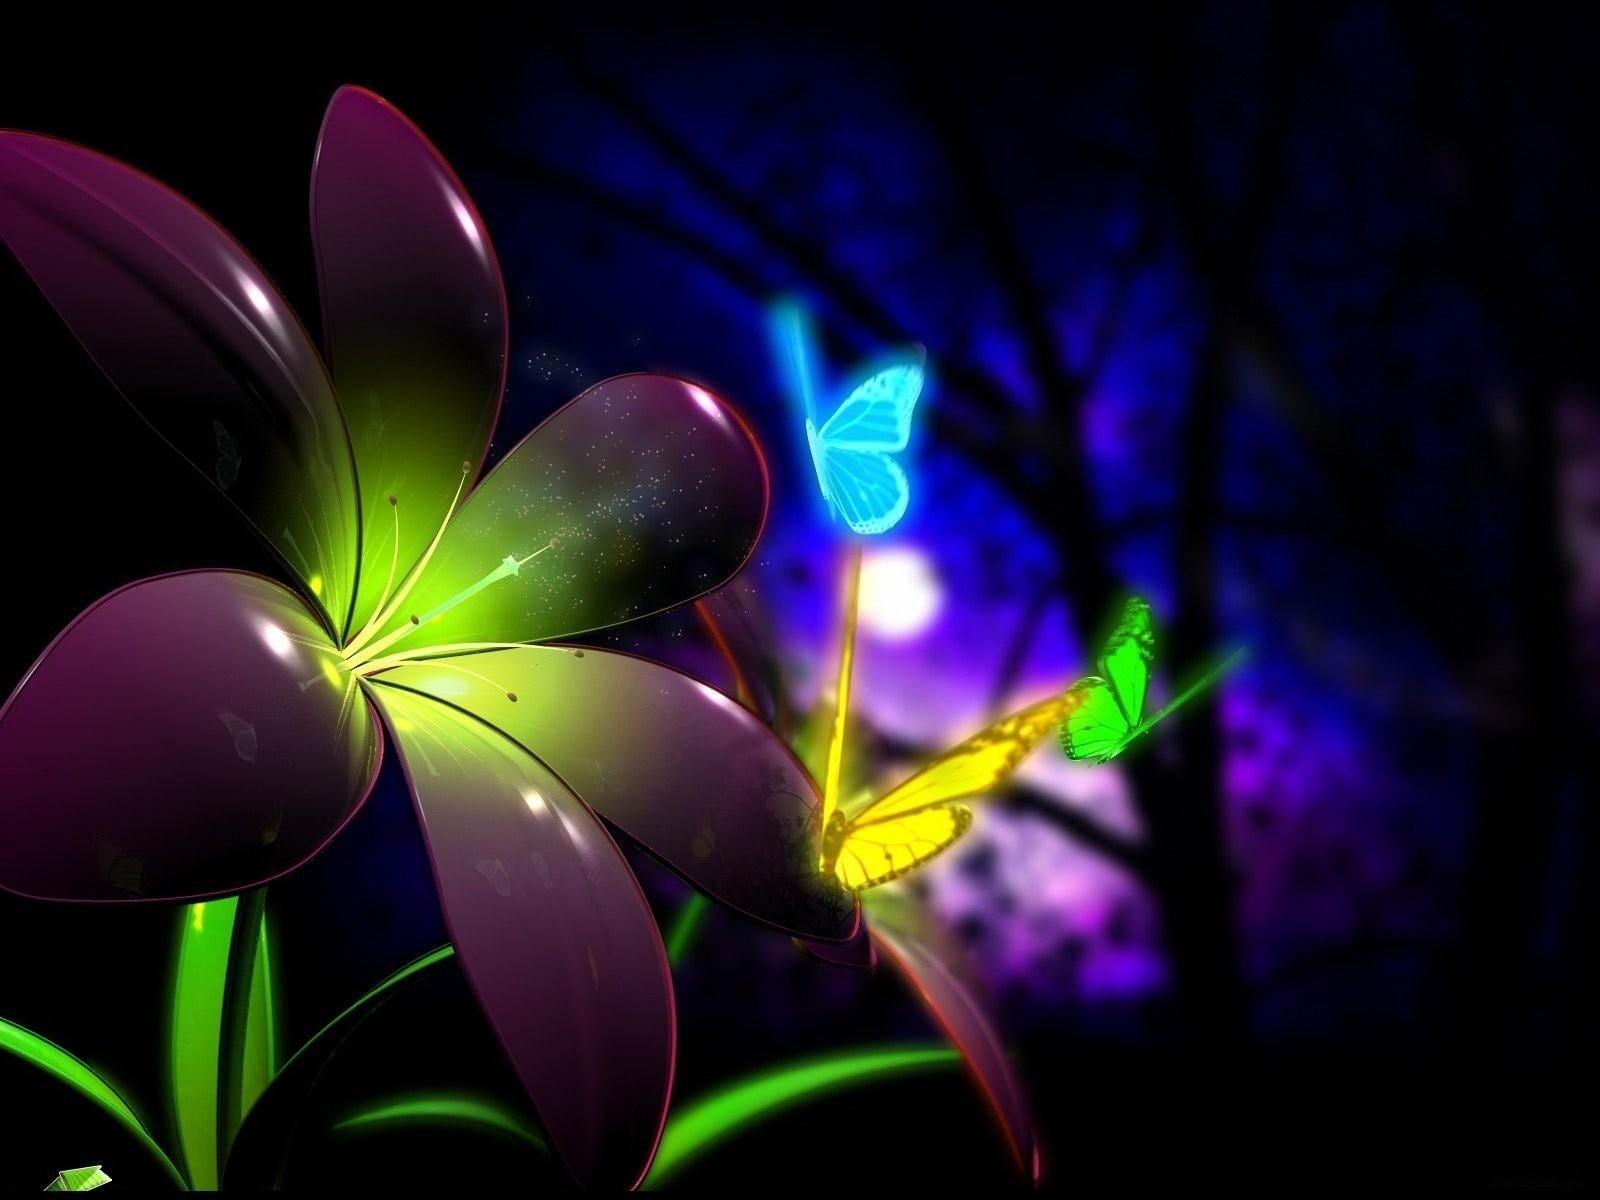 Fantasy Flowers Live Hd Wallpaper Latest Beautiful Wallpaper Images